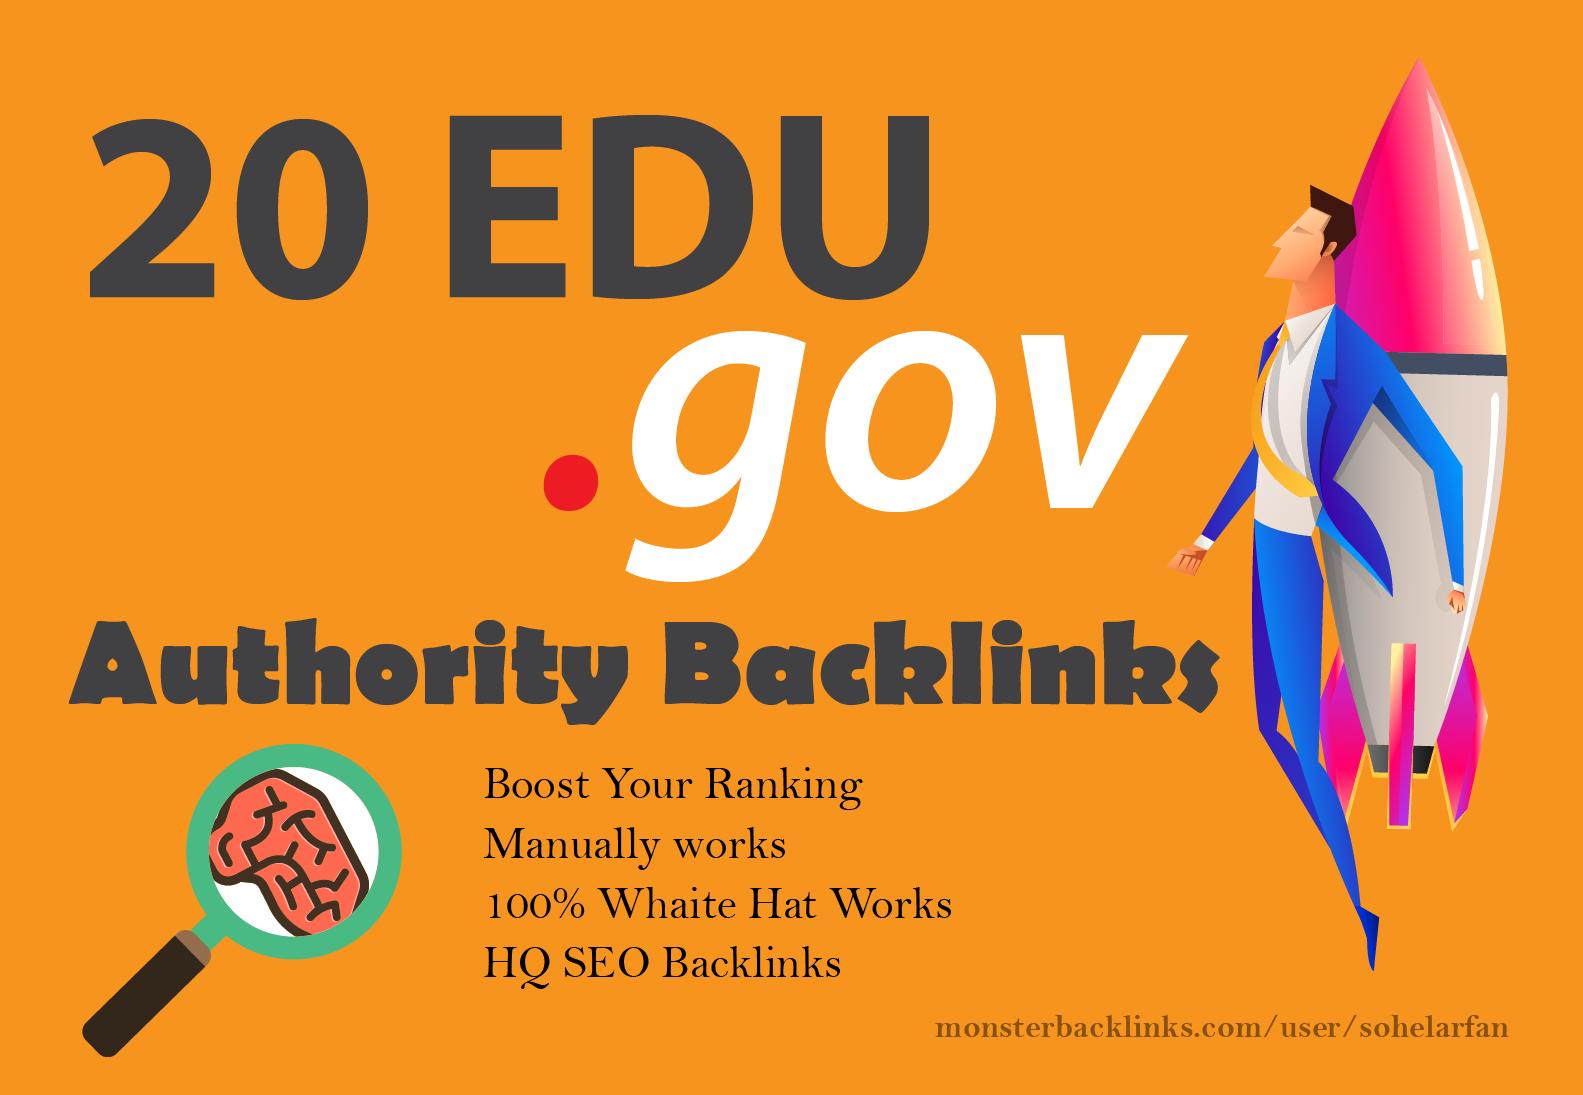 Manually Do Top 20 Edu and gov SEO Backlinks To Boost Your Website